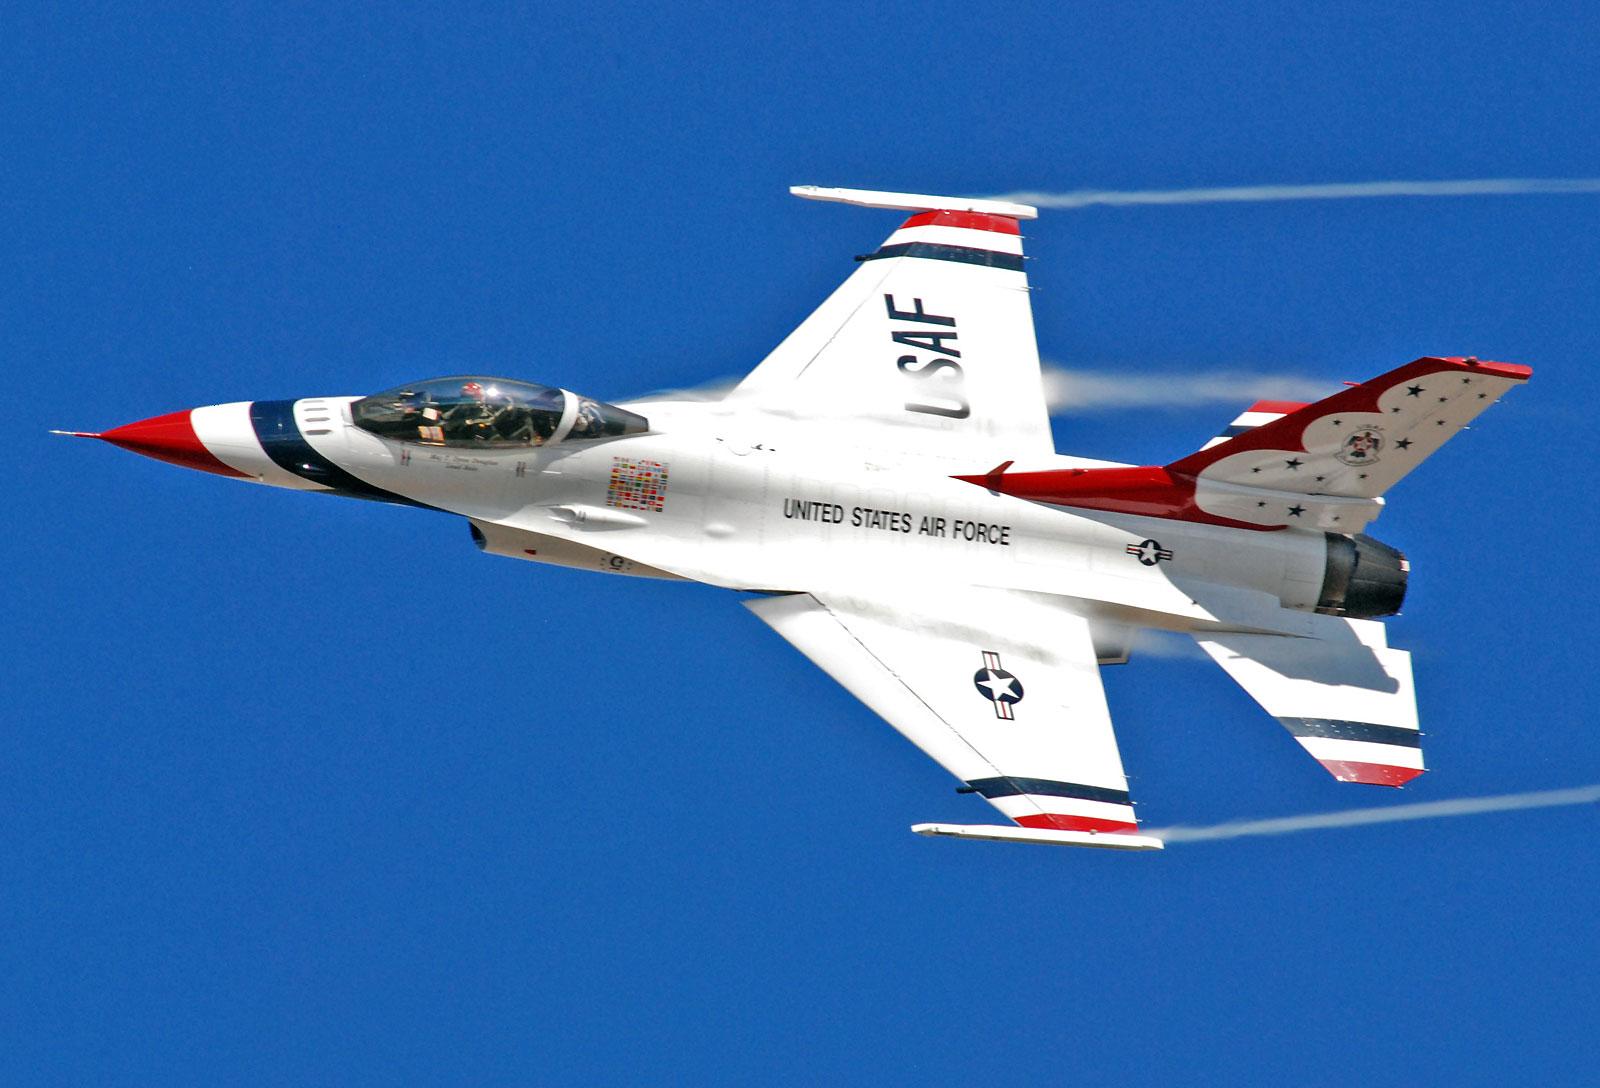 Air Force Thunderbirds 1600x1088 6143 HD Wallpaper Res 1600x1088